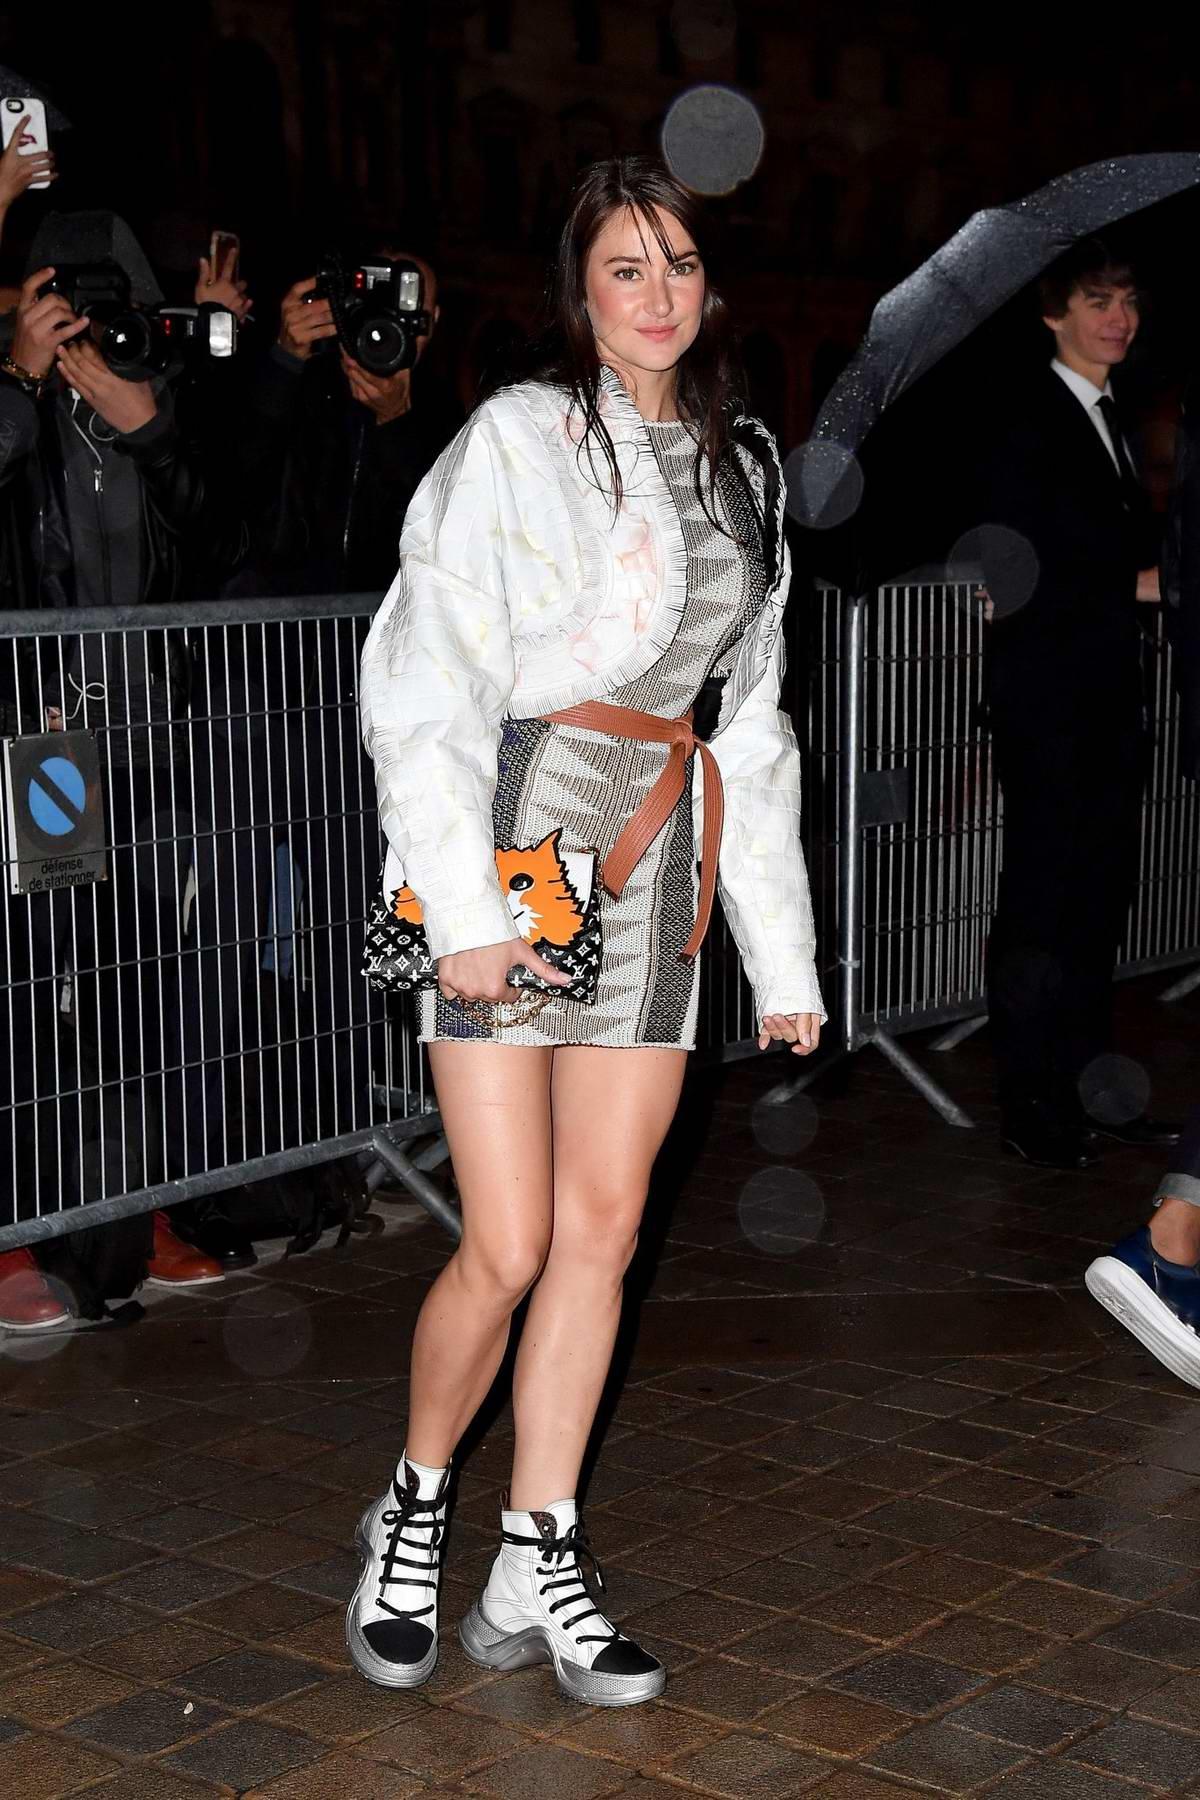 Shailene Woodley attending the Louis Vuitton show during Paris Fashion Week in Paris, France